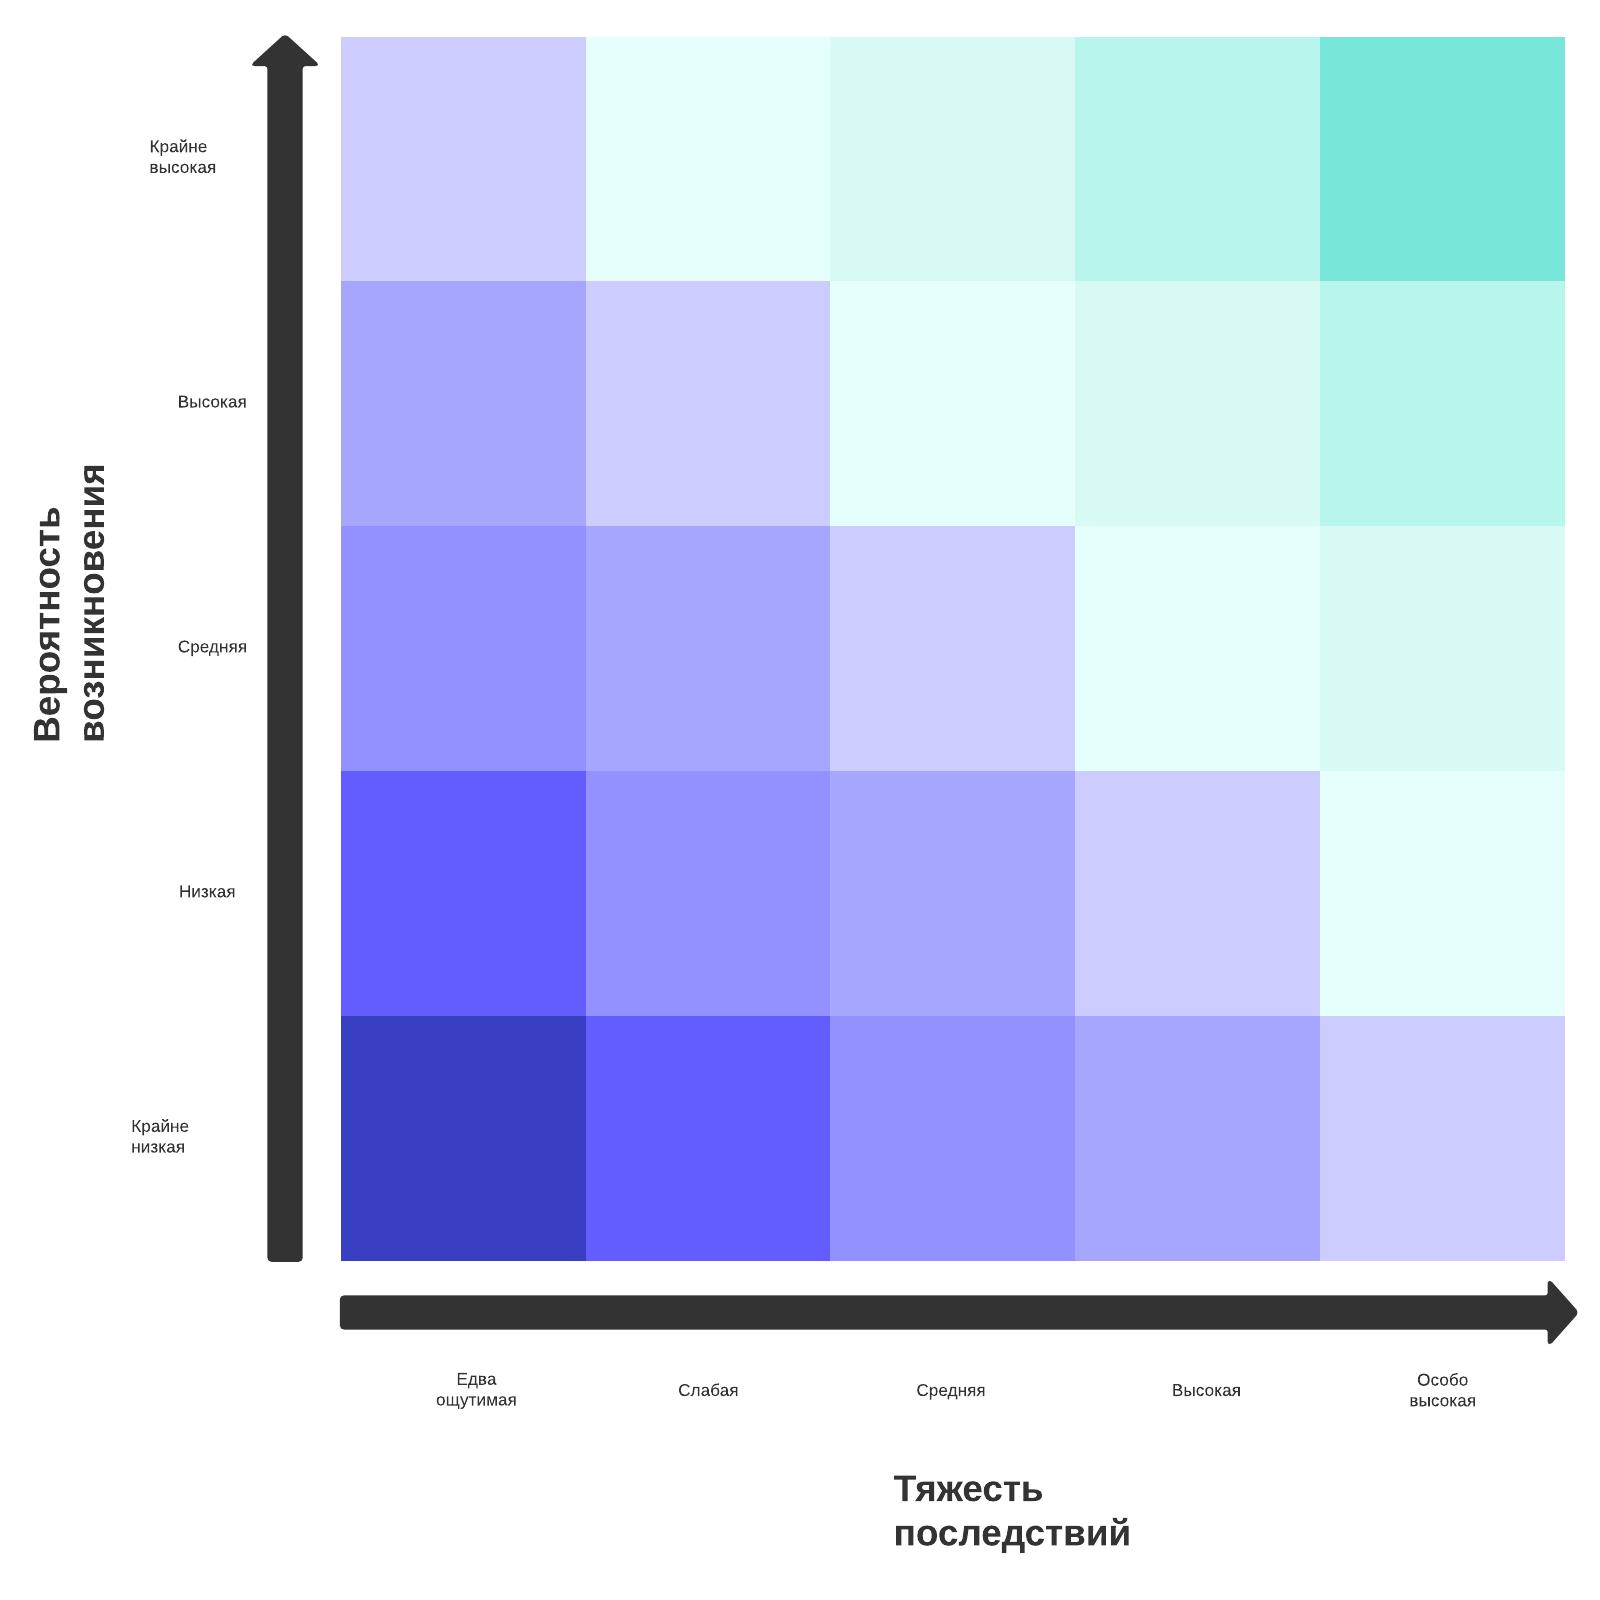 шаблон матрицы оценки рисков